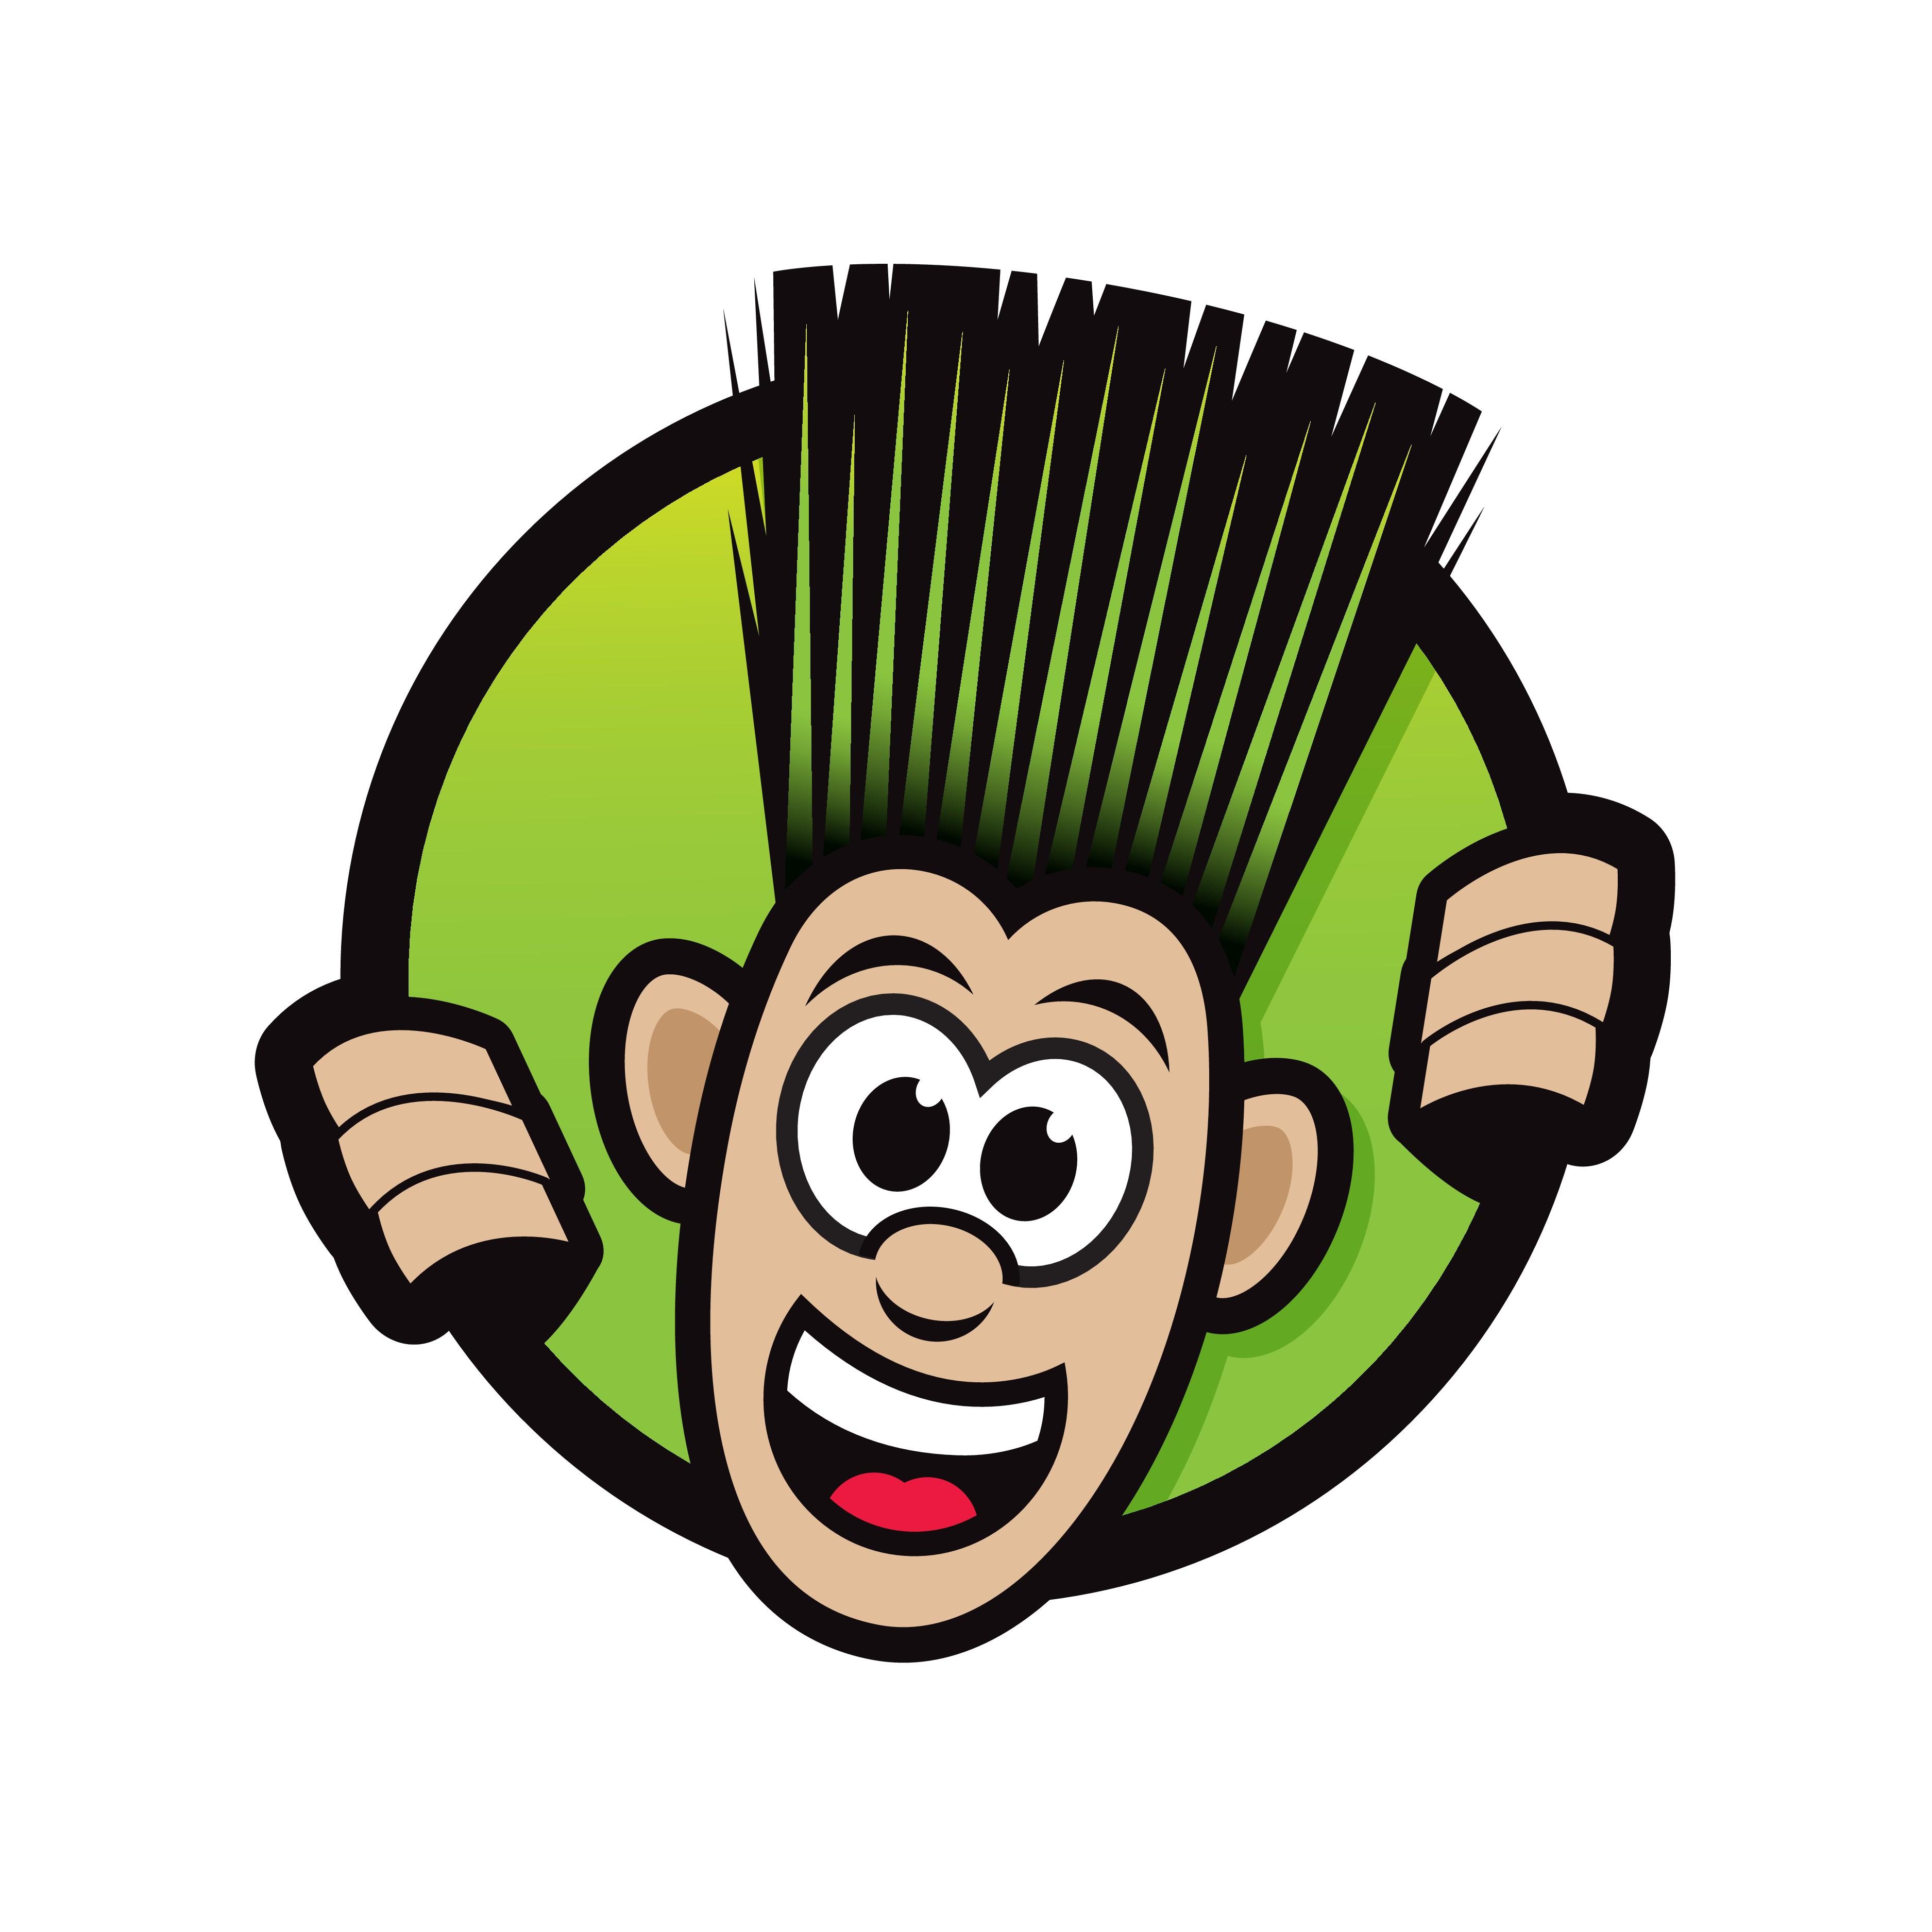 Create a online brand logo for thebrushshop.com